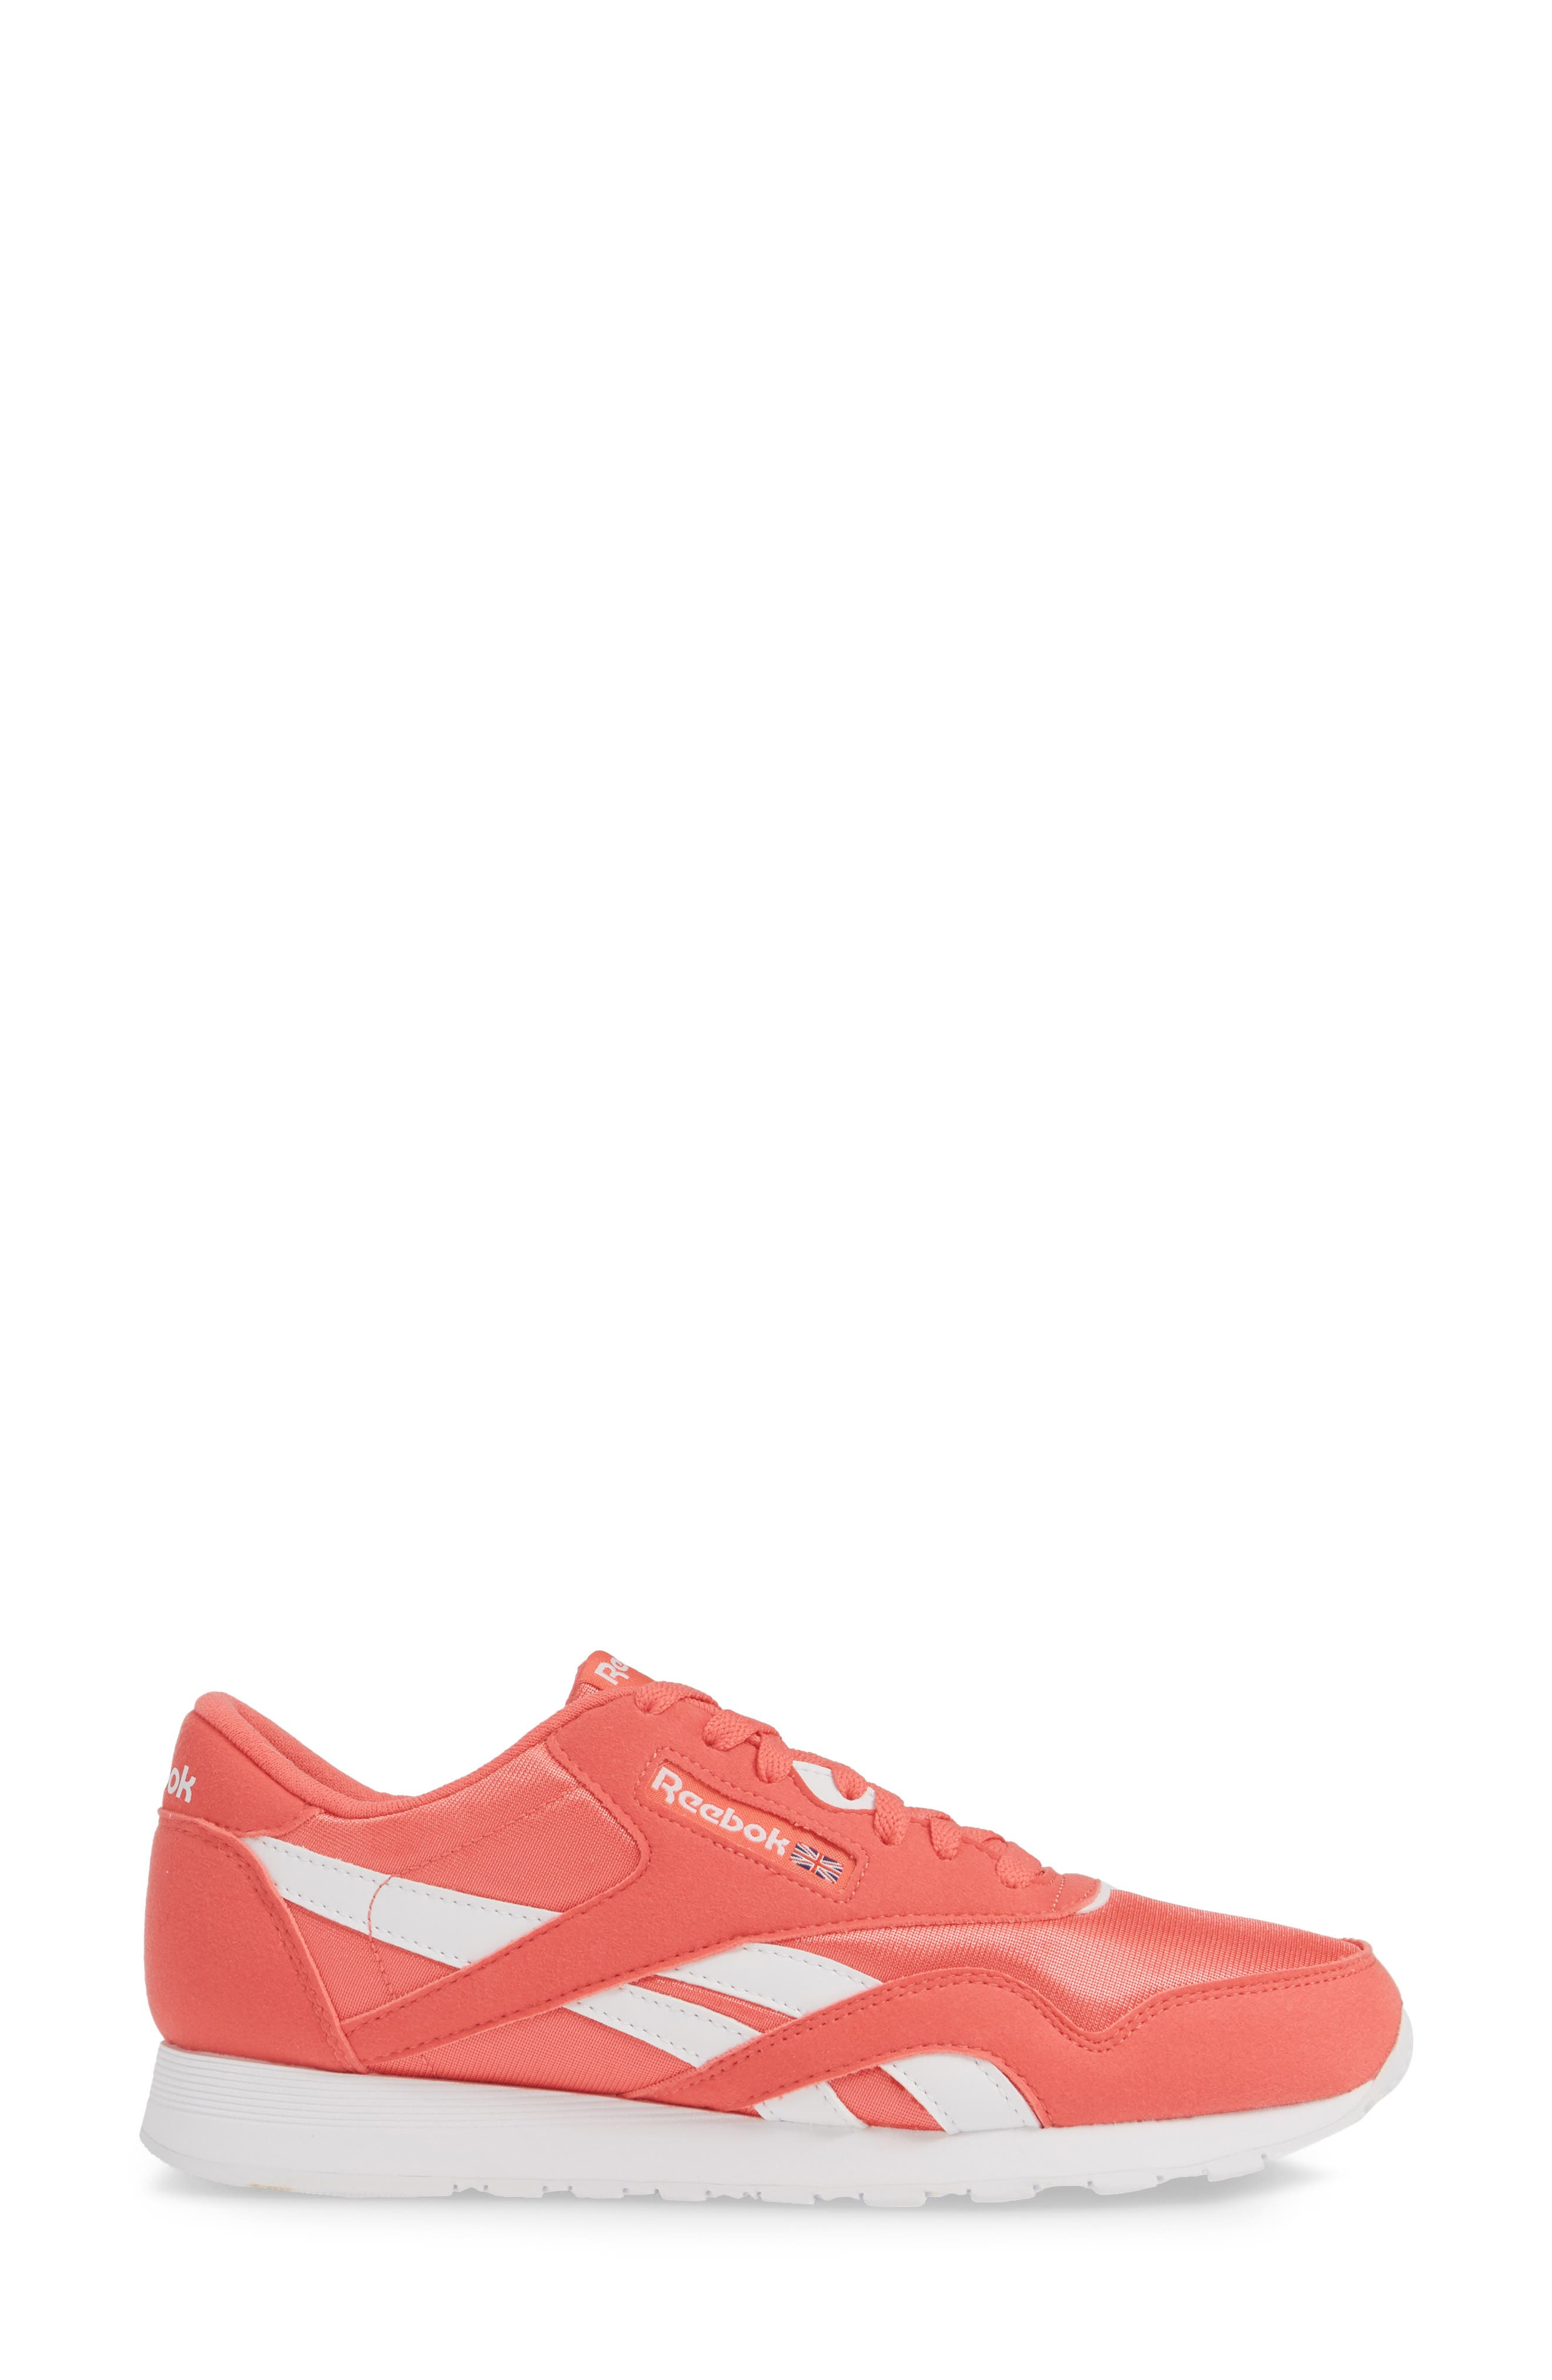 ,                             Classic Nylon Sneaker,                             Alternate thumbnail 17, color,                             600